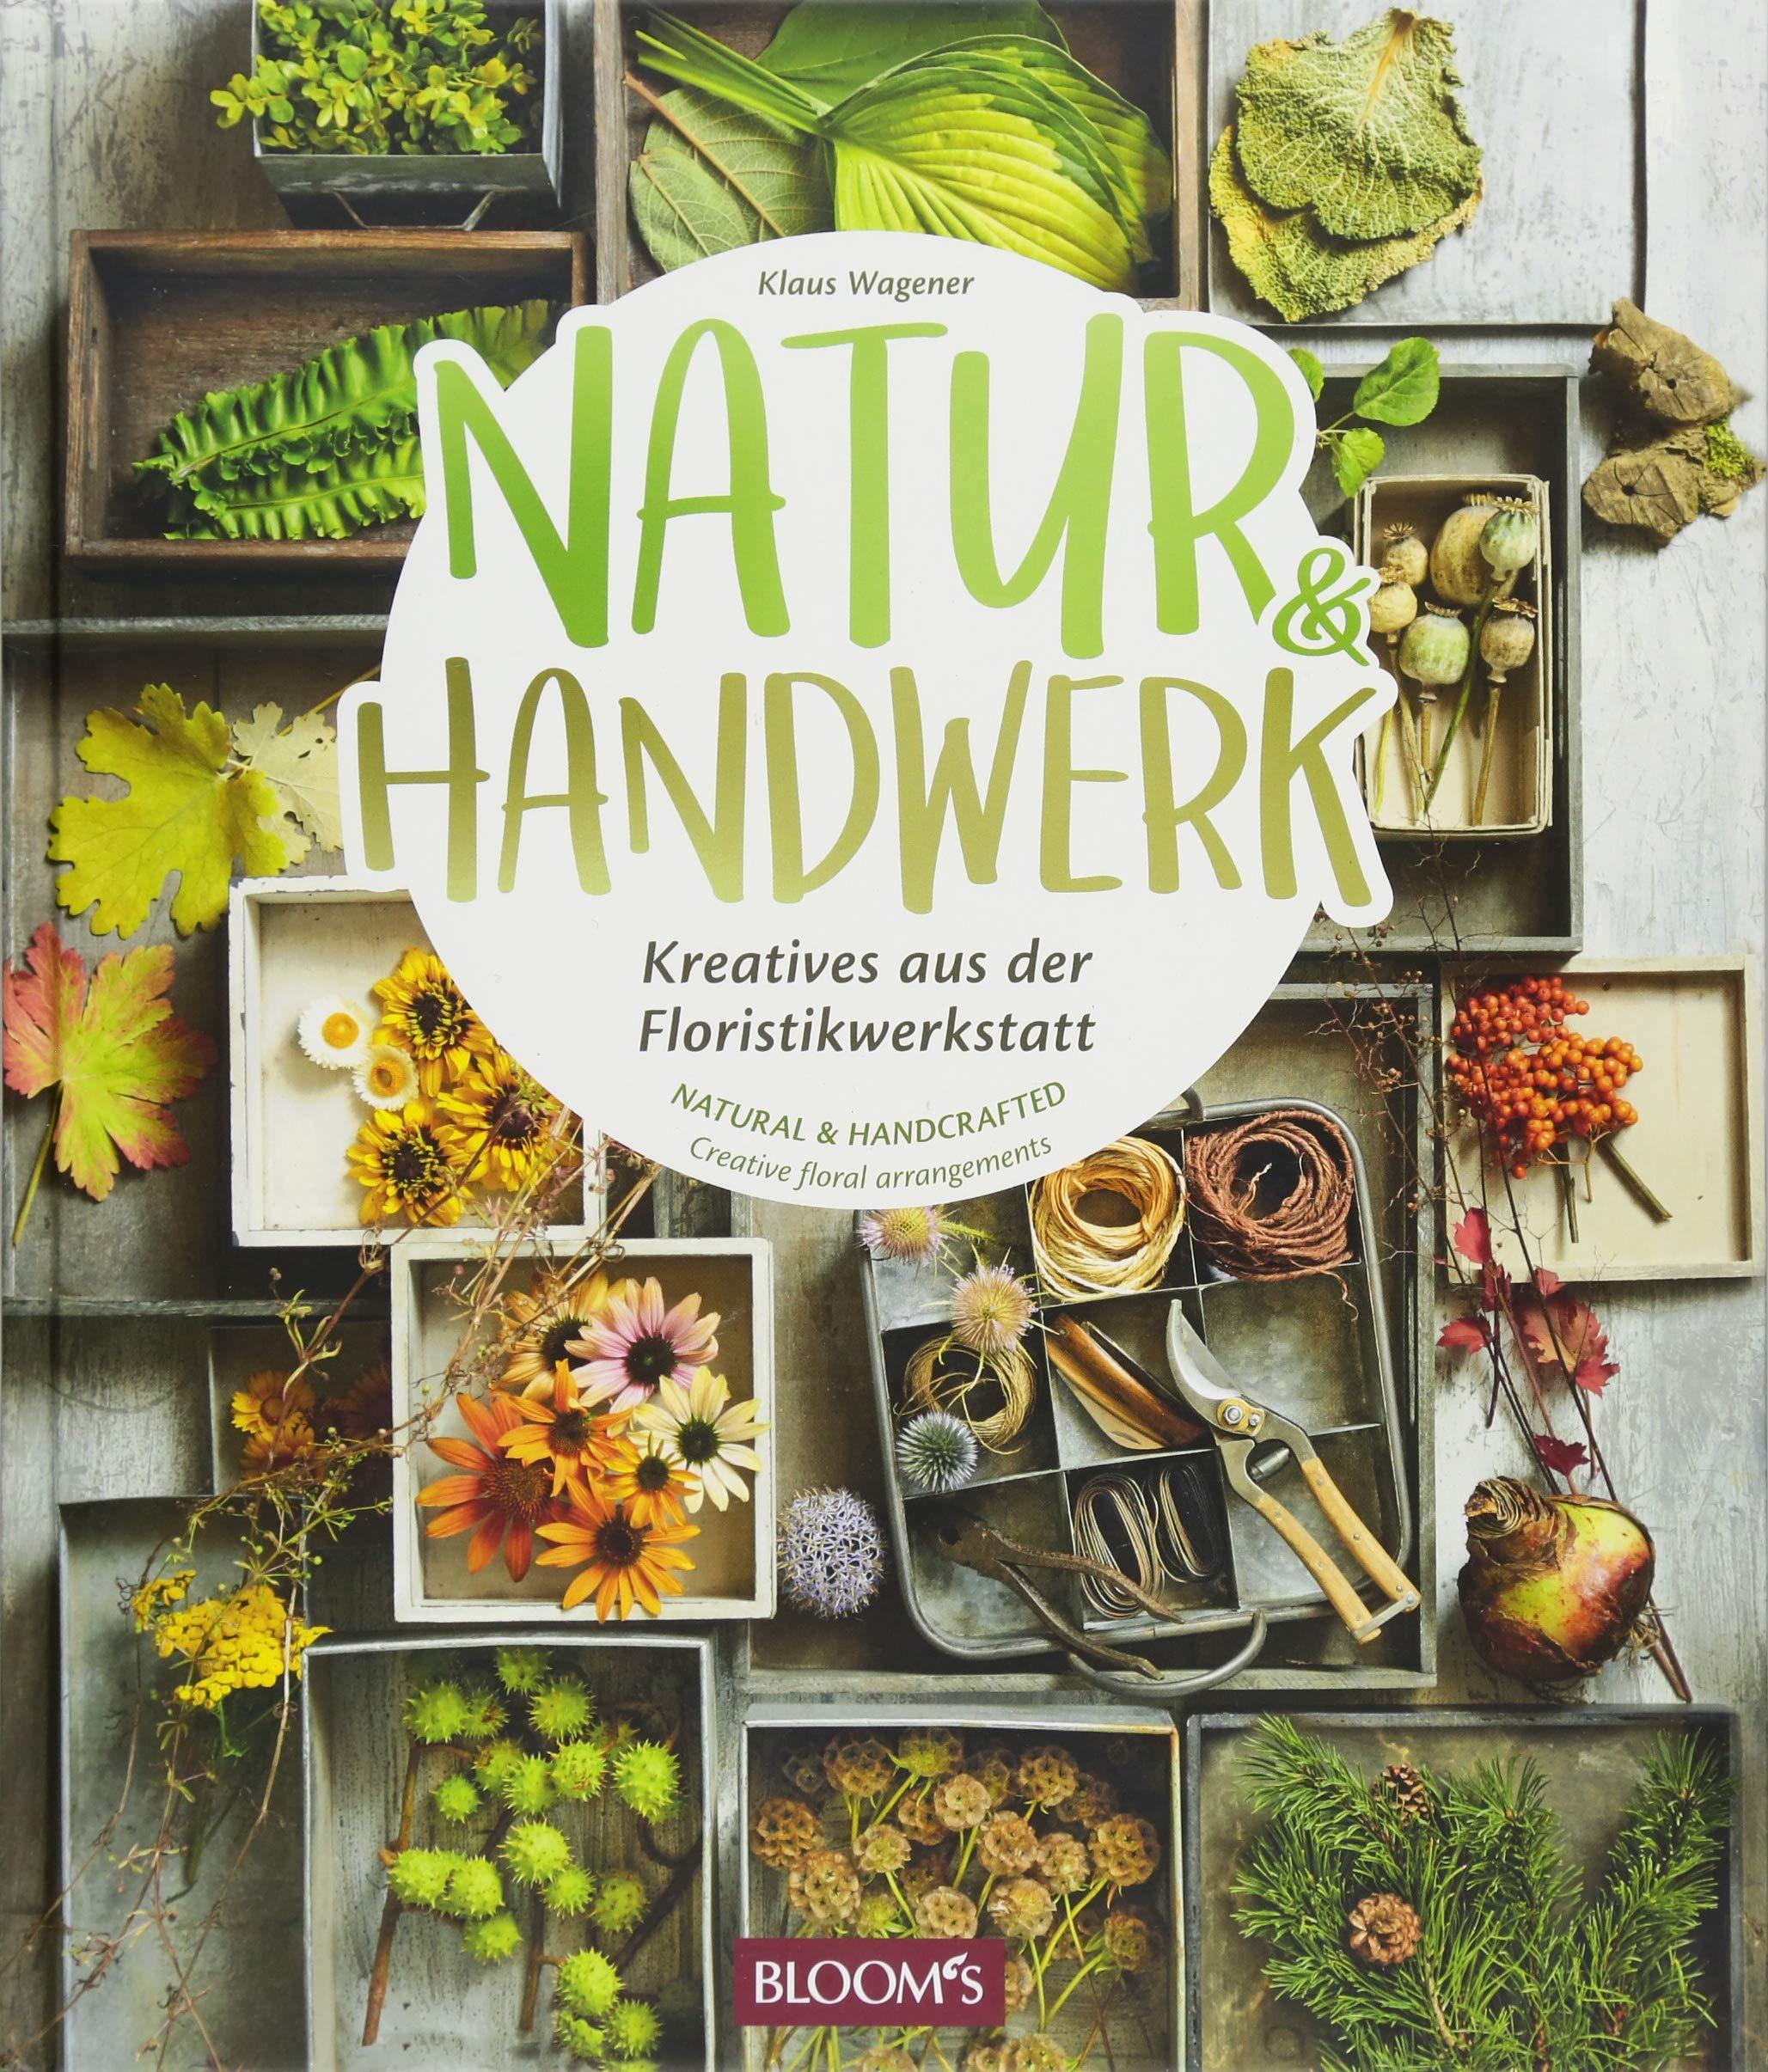 Natur & Handwerk: Kreatives aus der Floristikwerkstatt